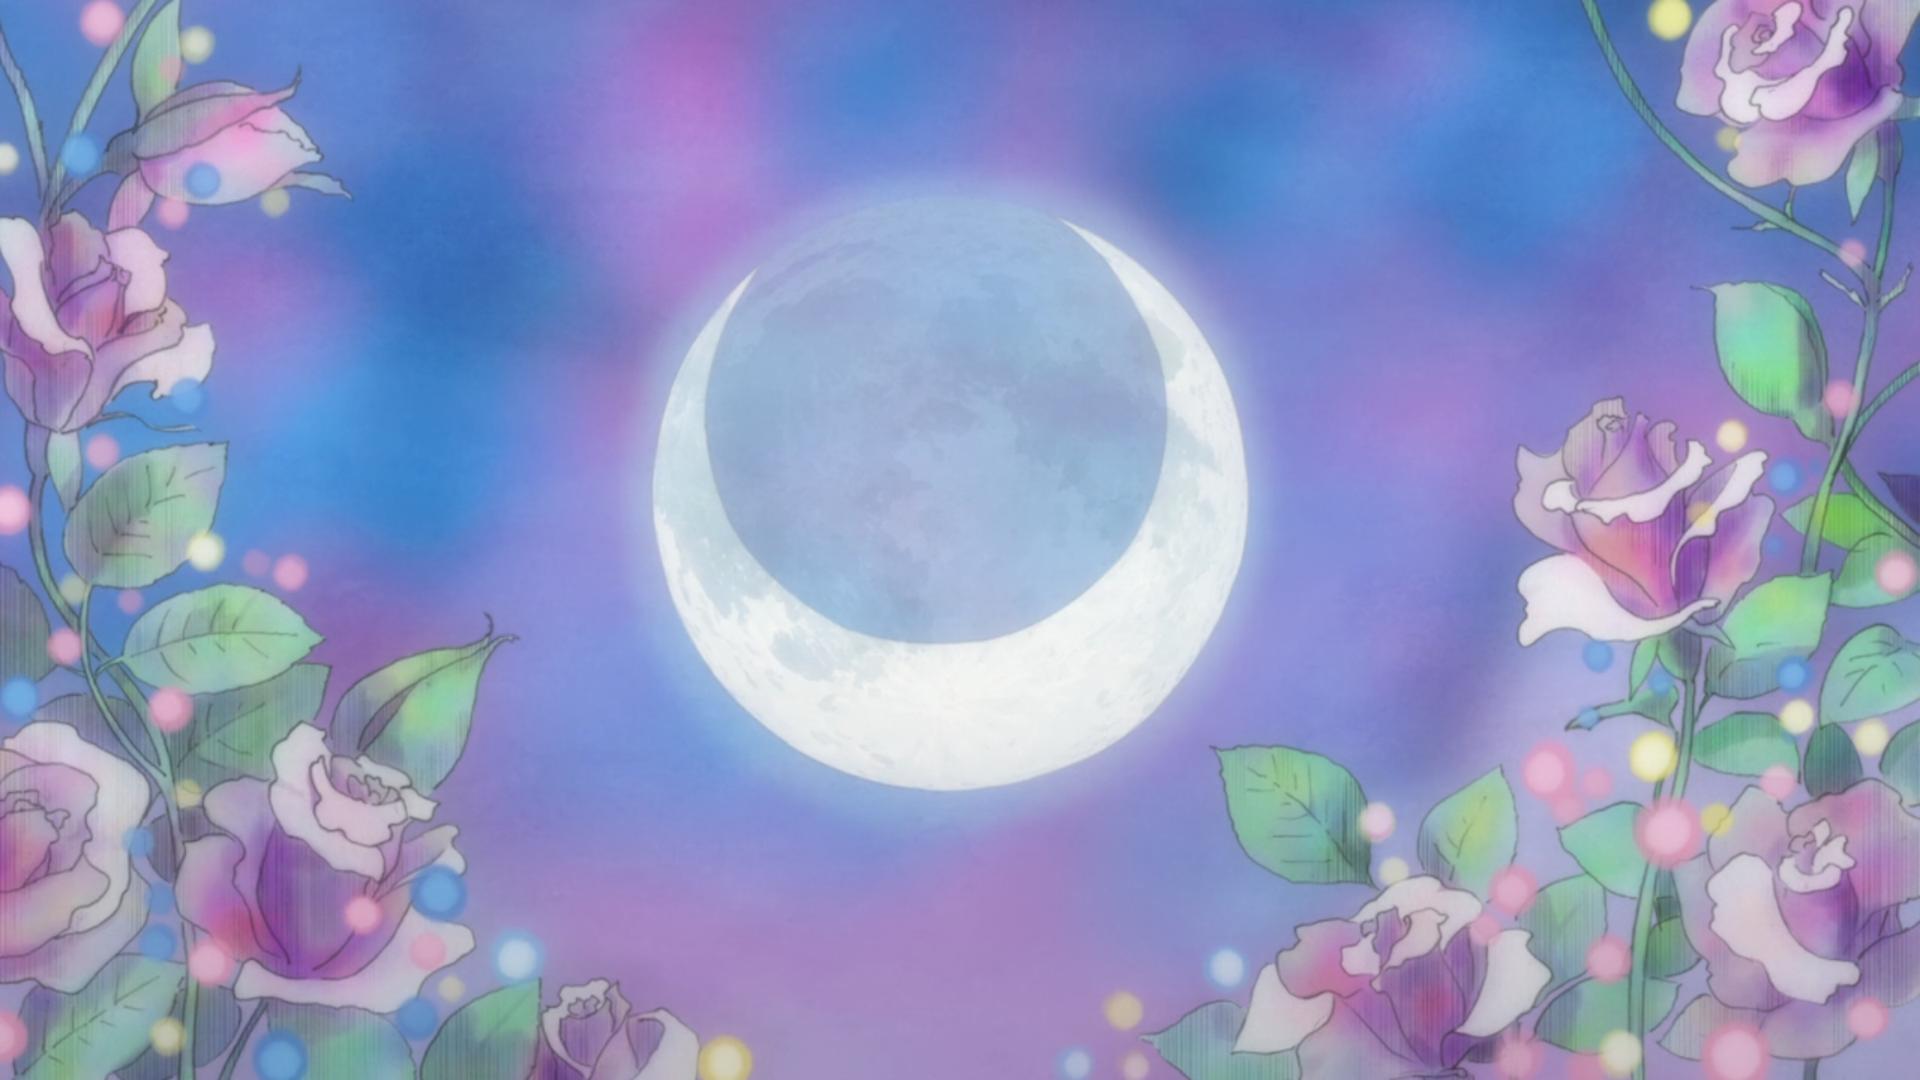 Download Sailor Moon Desktop Background High quality